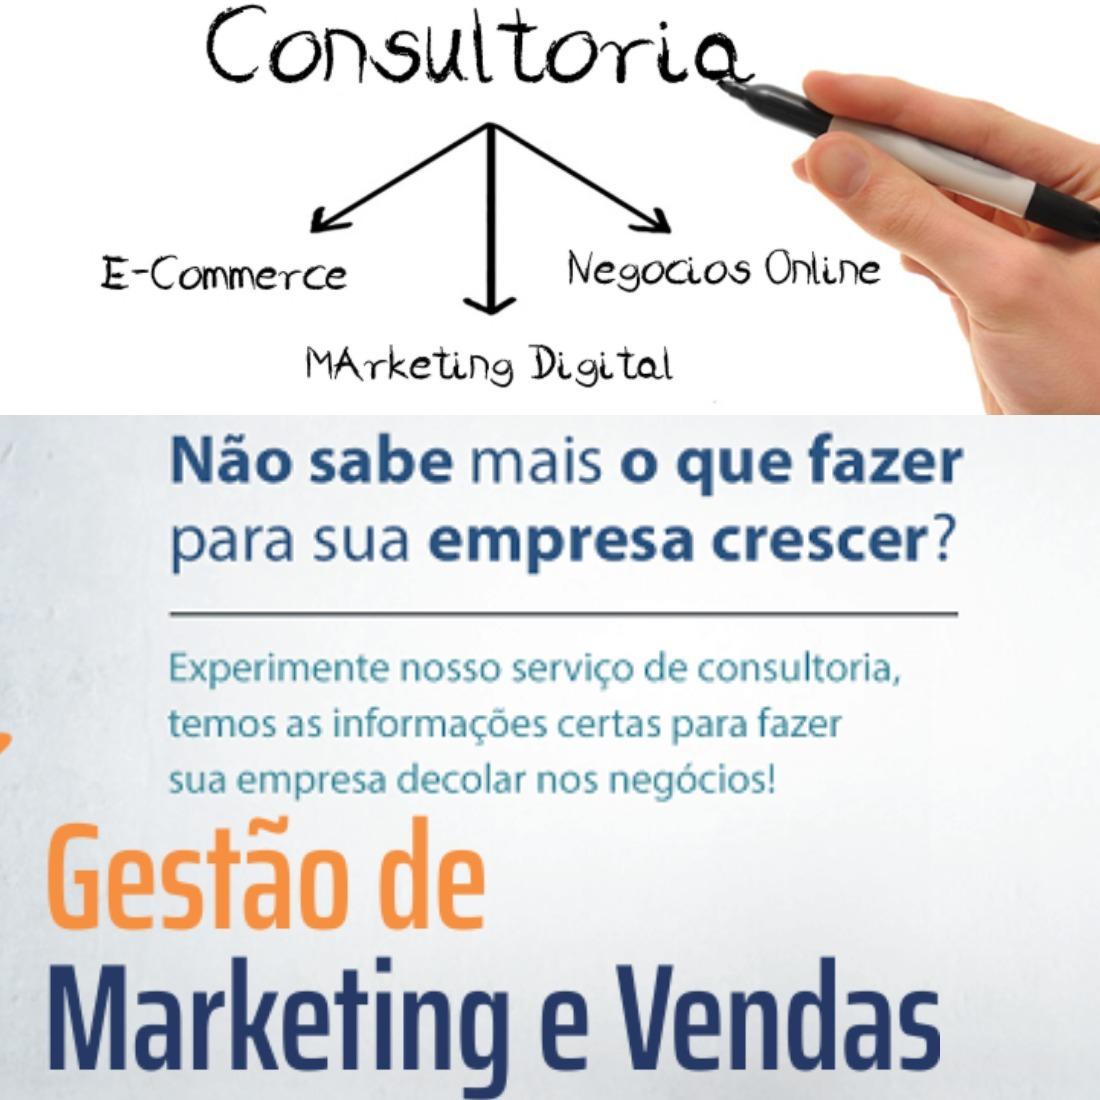 88217b9c0 Consultoria Para Loja Virtual Em São Paulo Markting Digital - R  39 ...